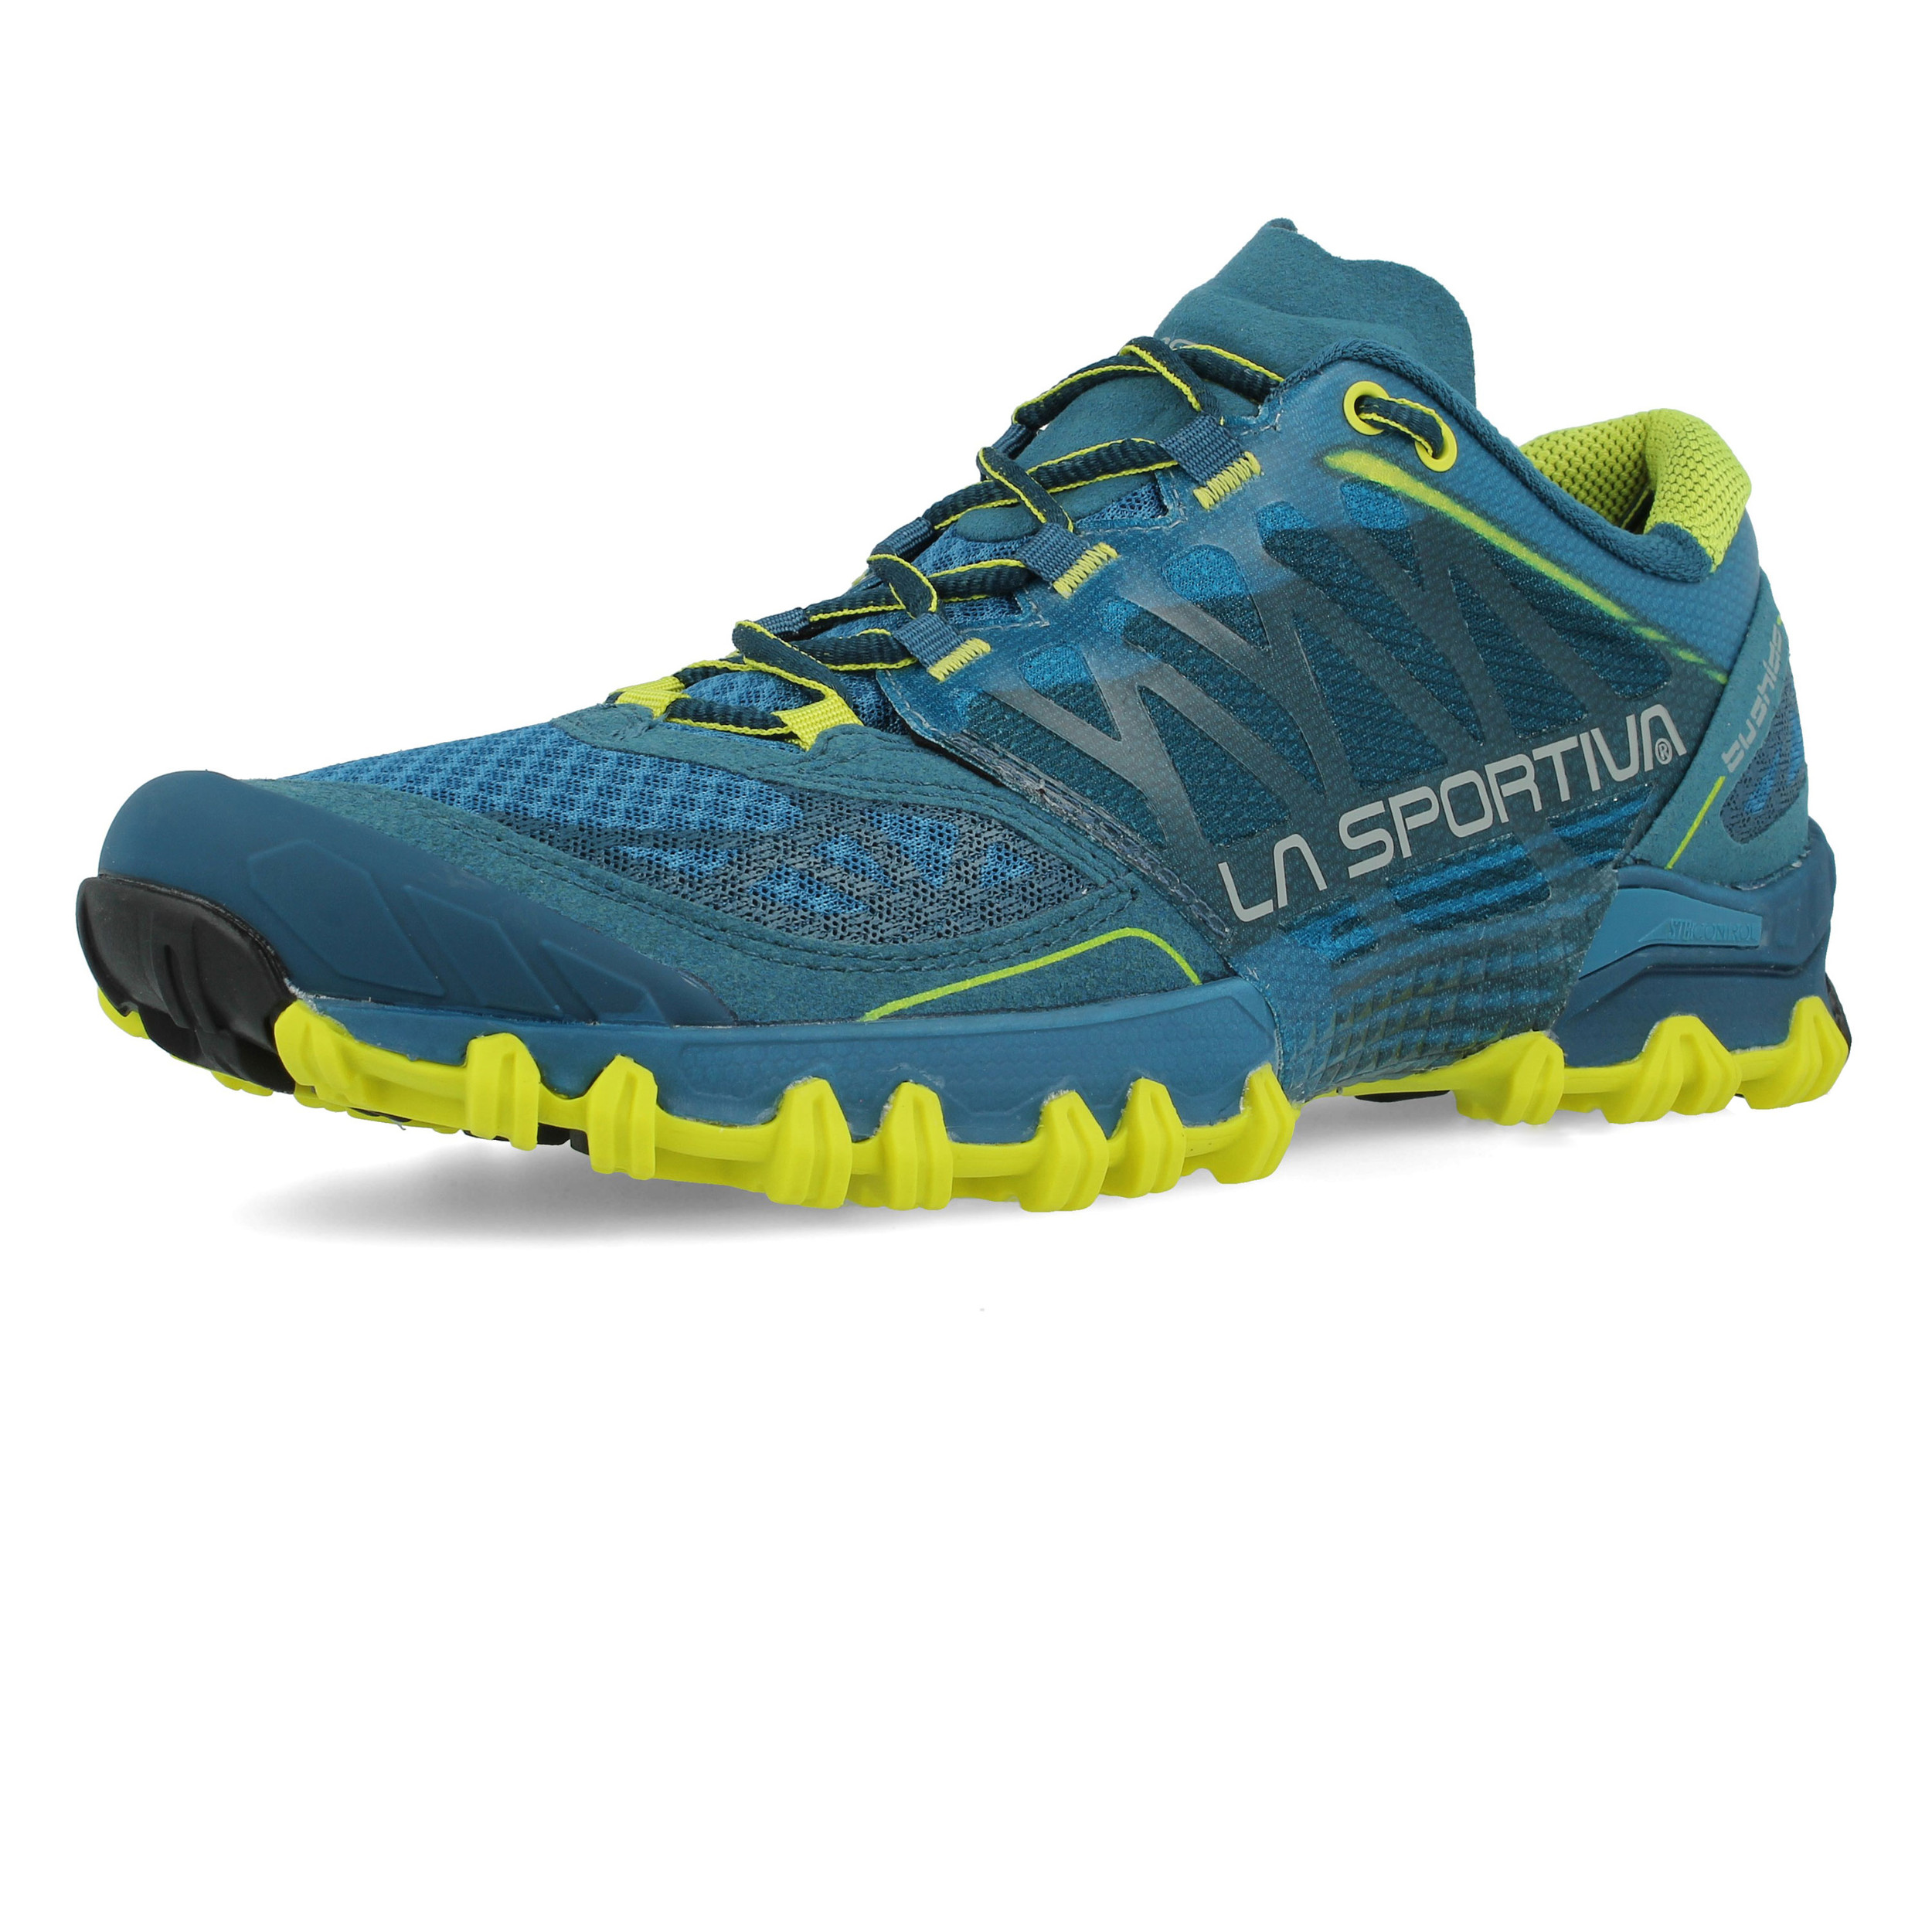 b6be766633e190 La Sportiva Herren Blau Bushido Trail Jogging Schuhe Laufschuhe ...